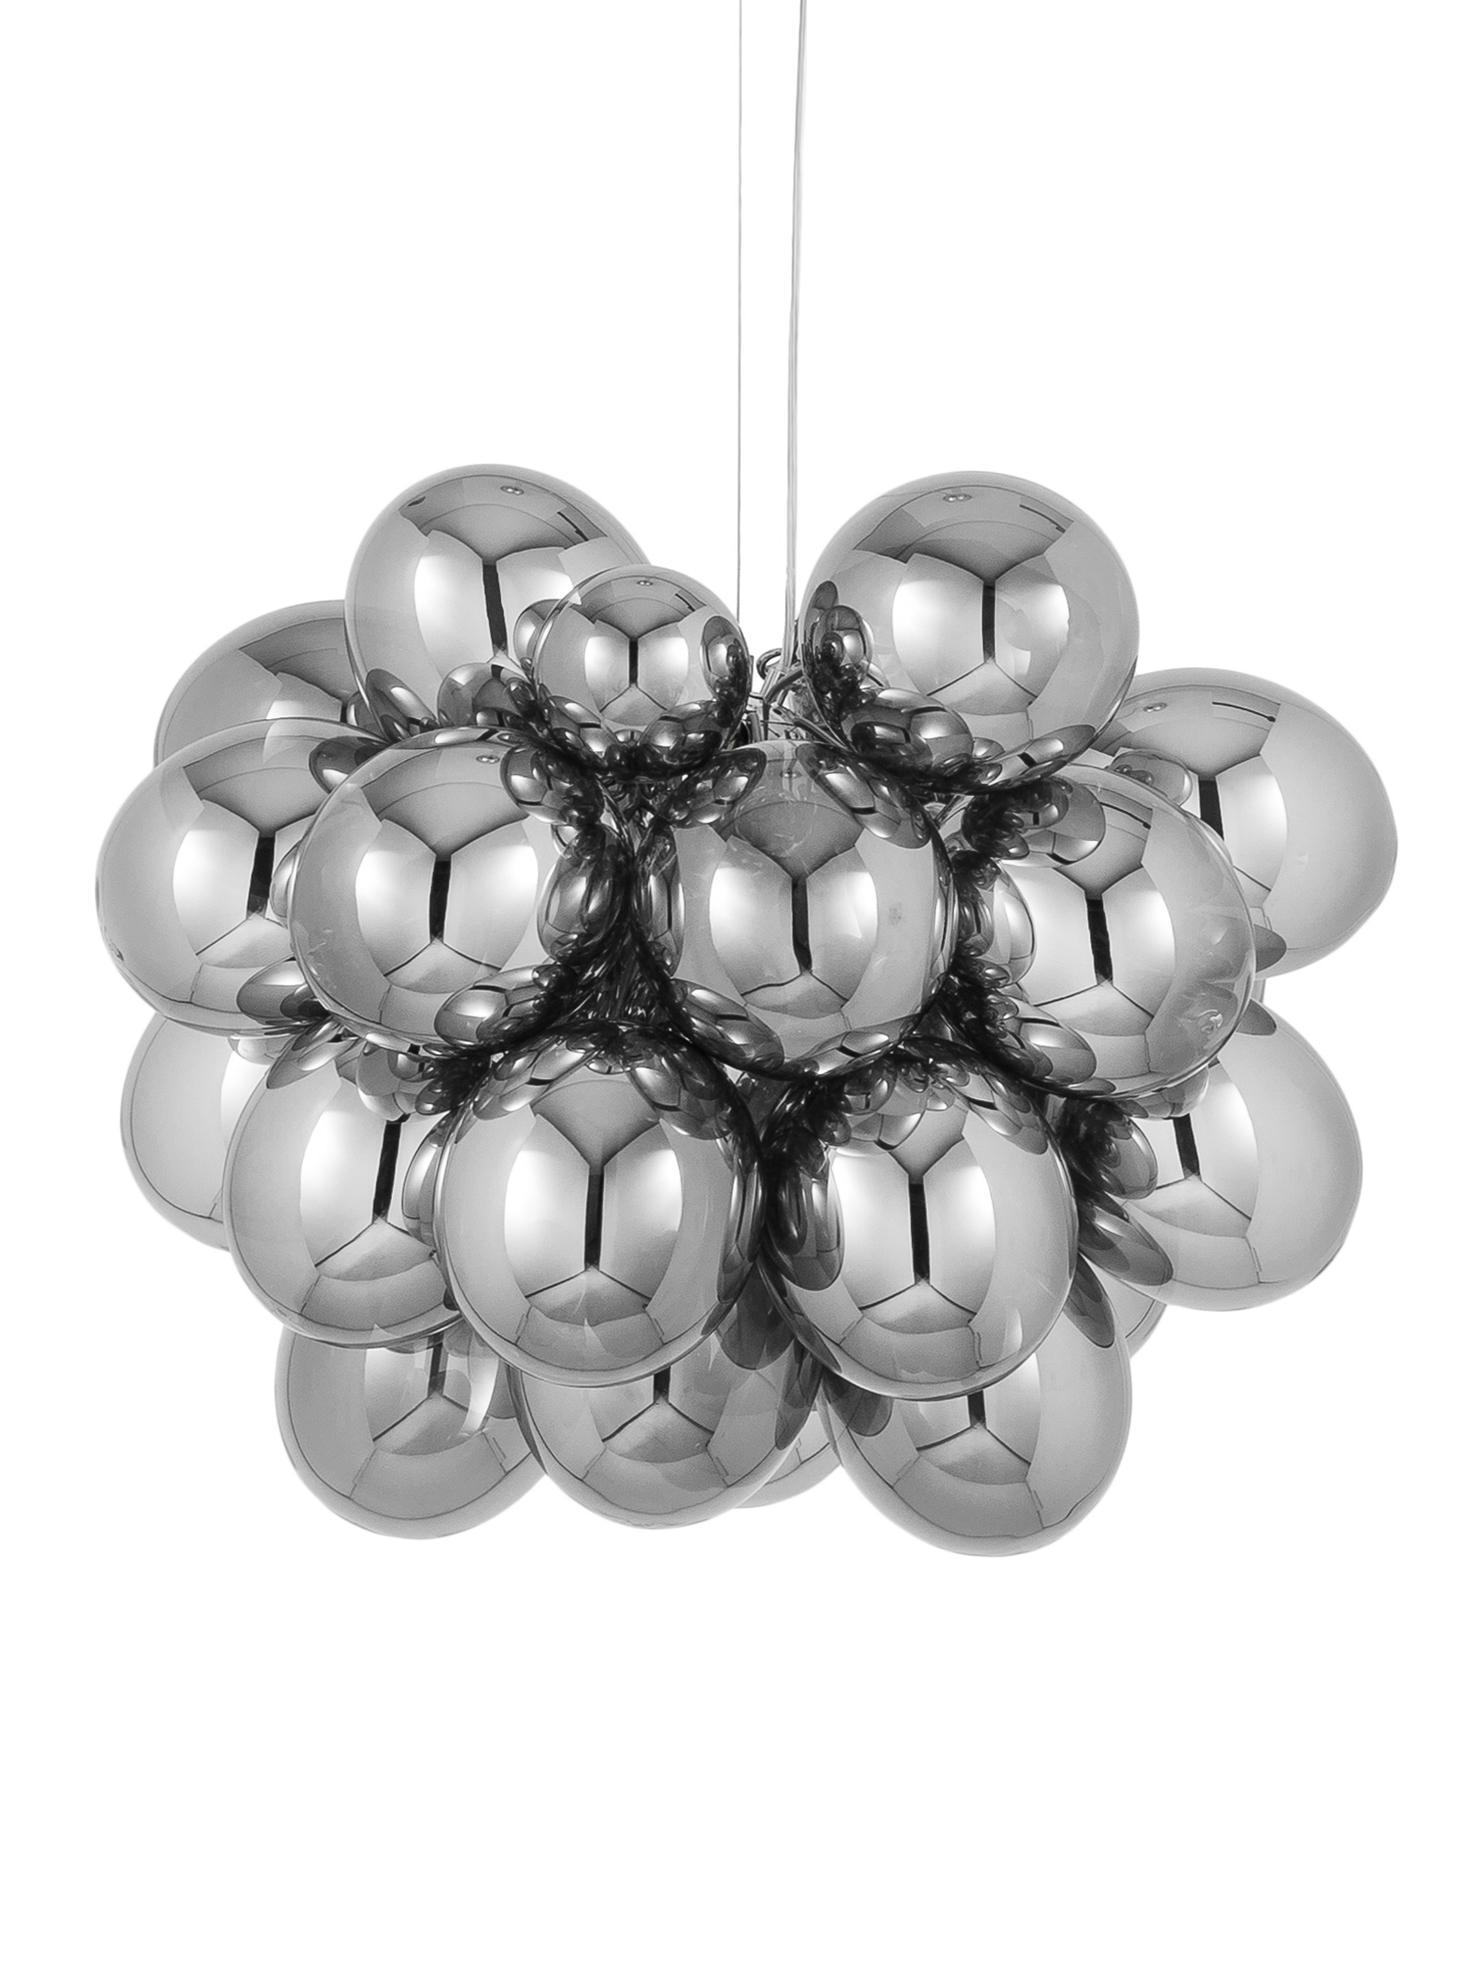 Glaskugel-Pendelleuchte Gross Grande, Chrom, Ø 62 x H 50 cm